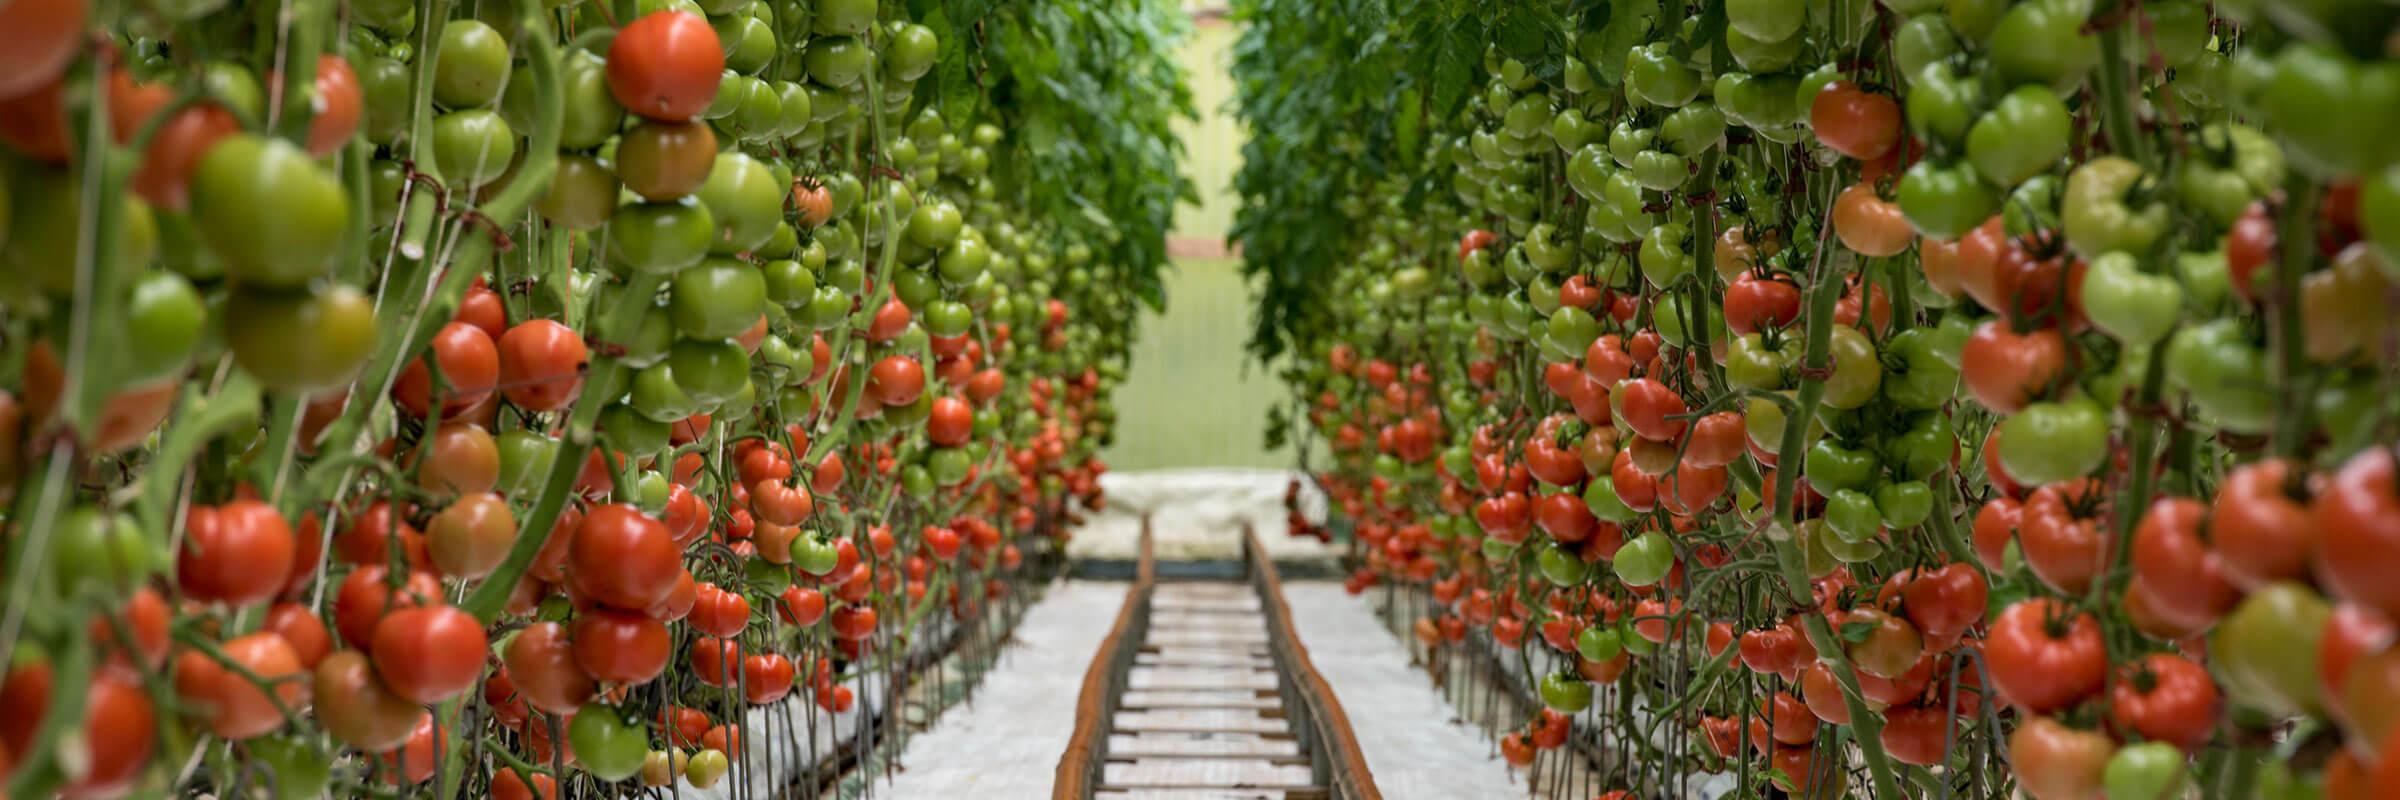 Kawamata tomatoes